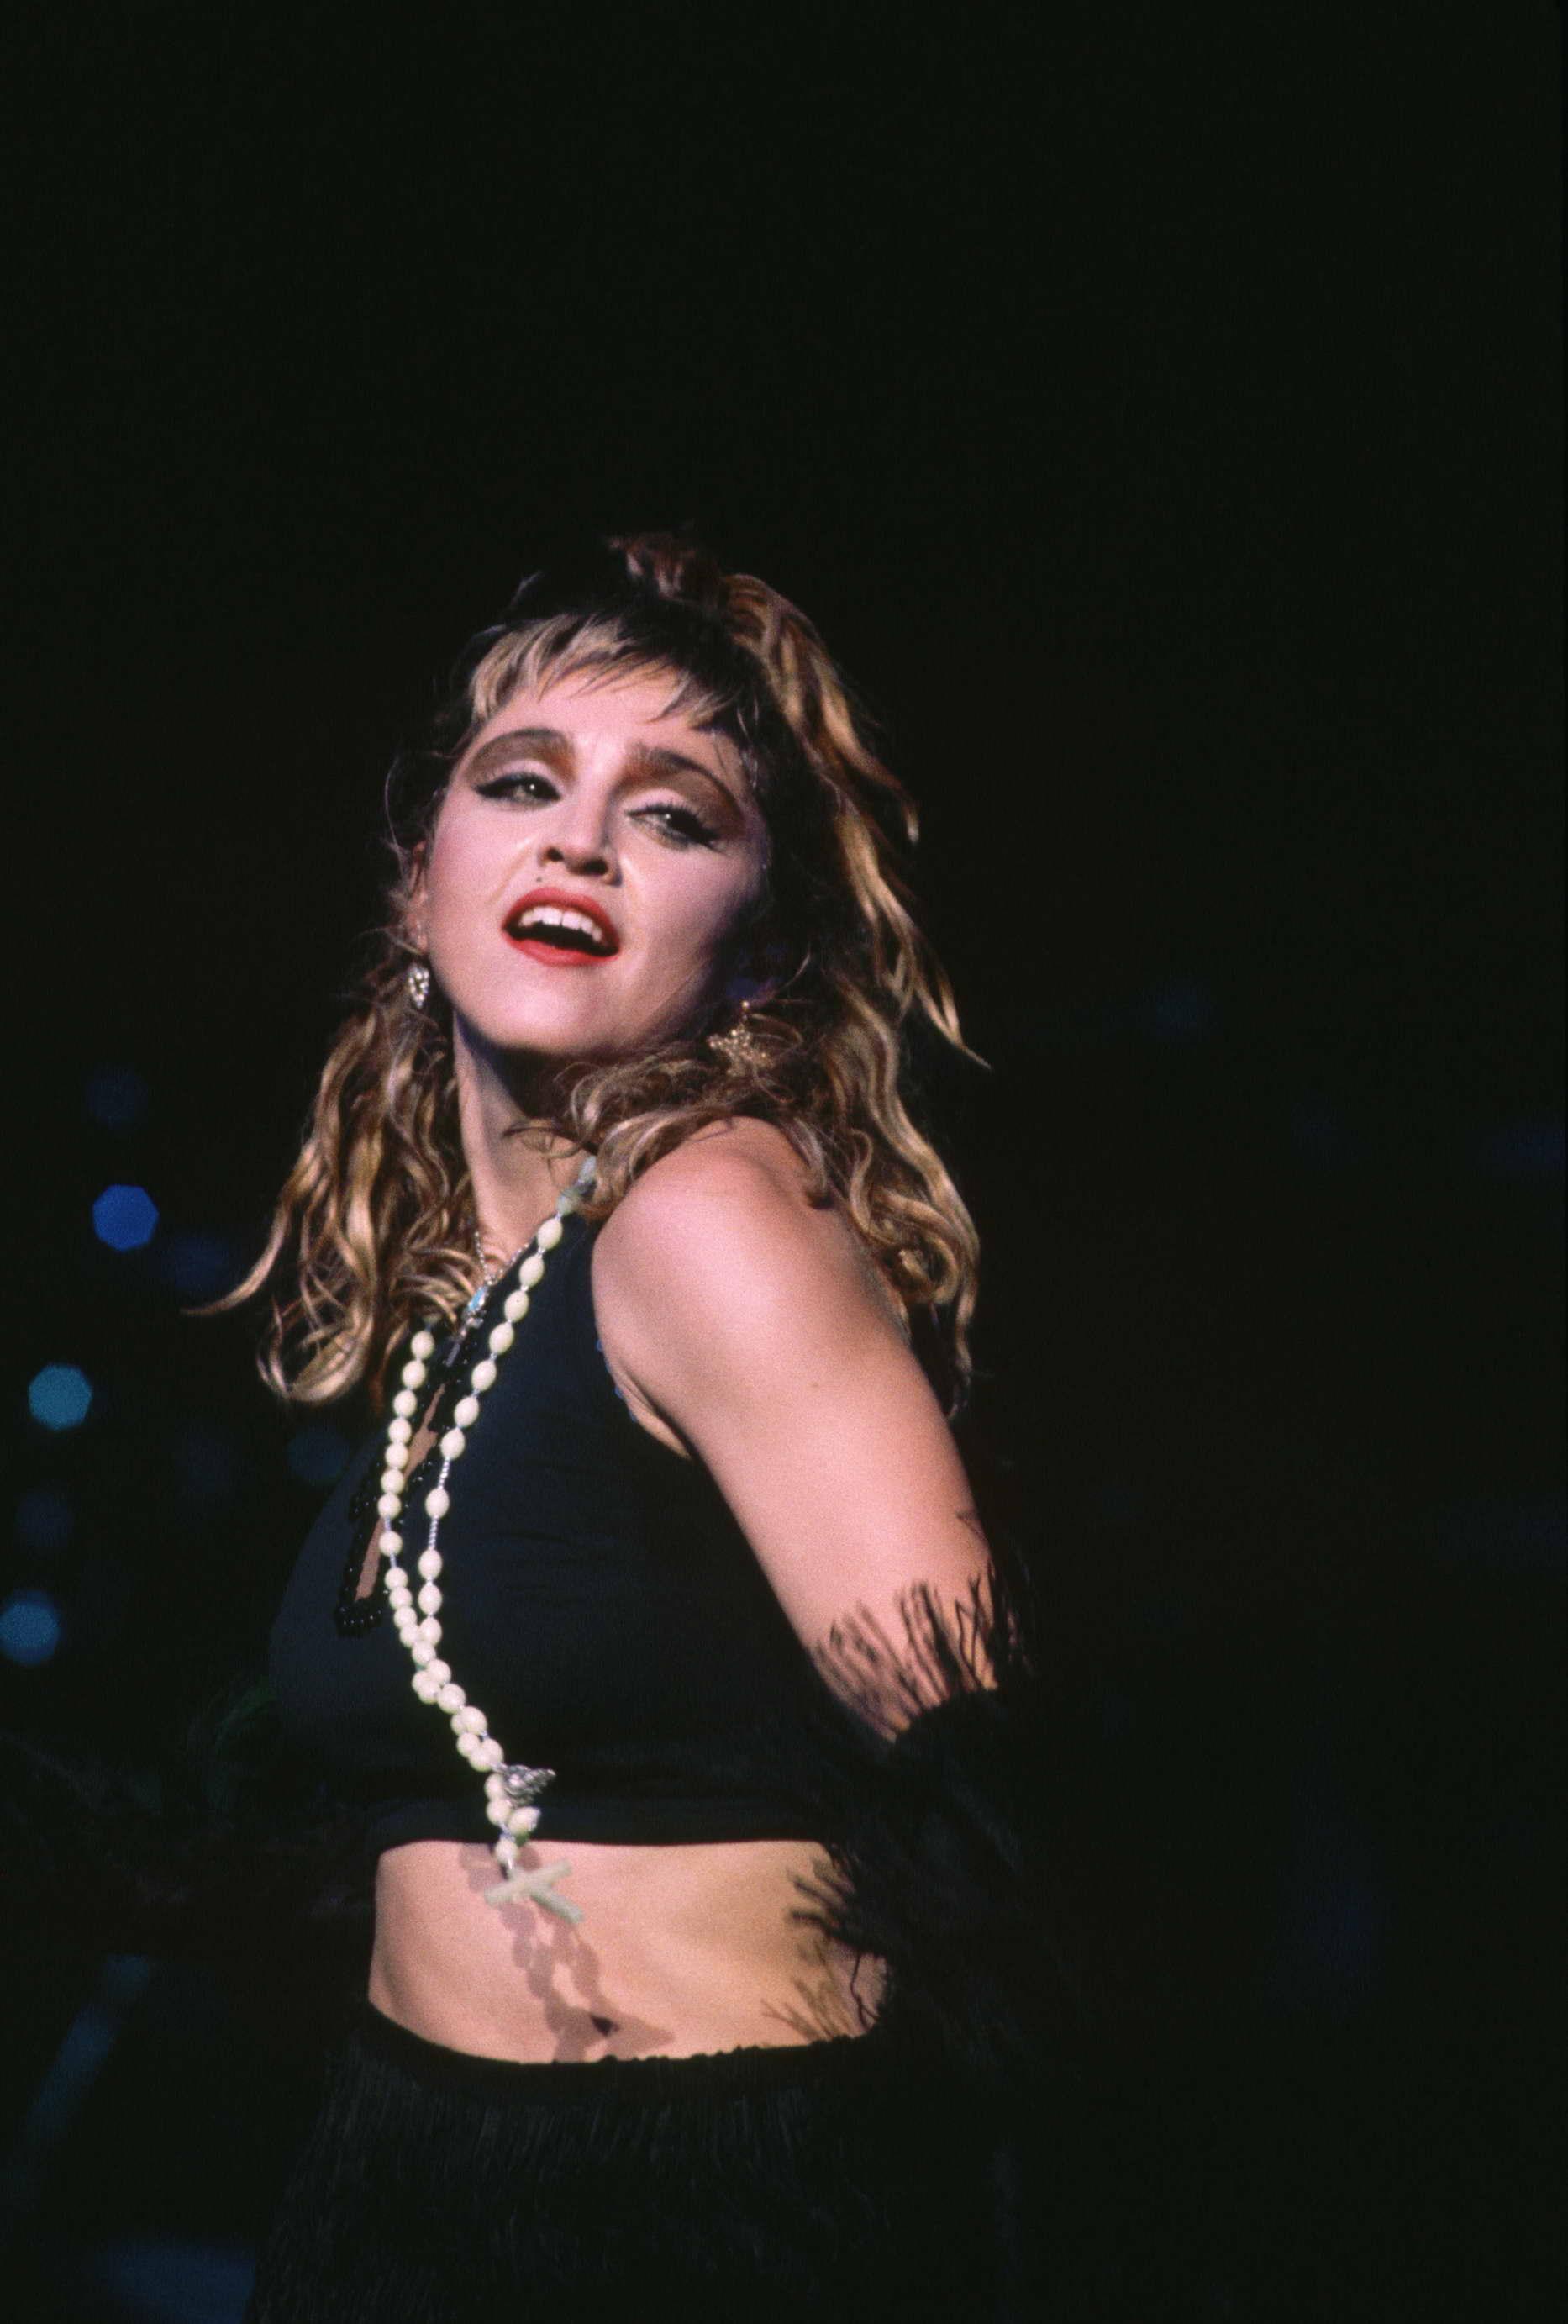 madonna 1985 virgin tour - photo #5